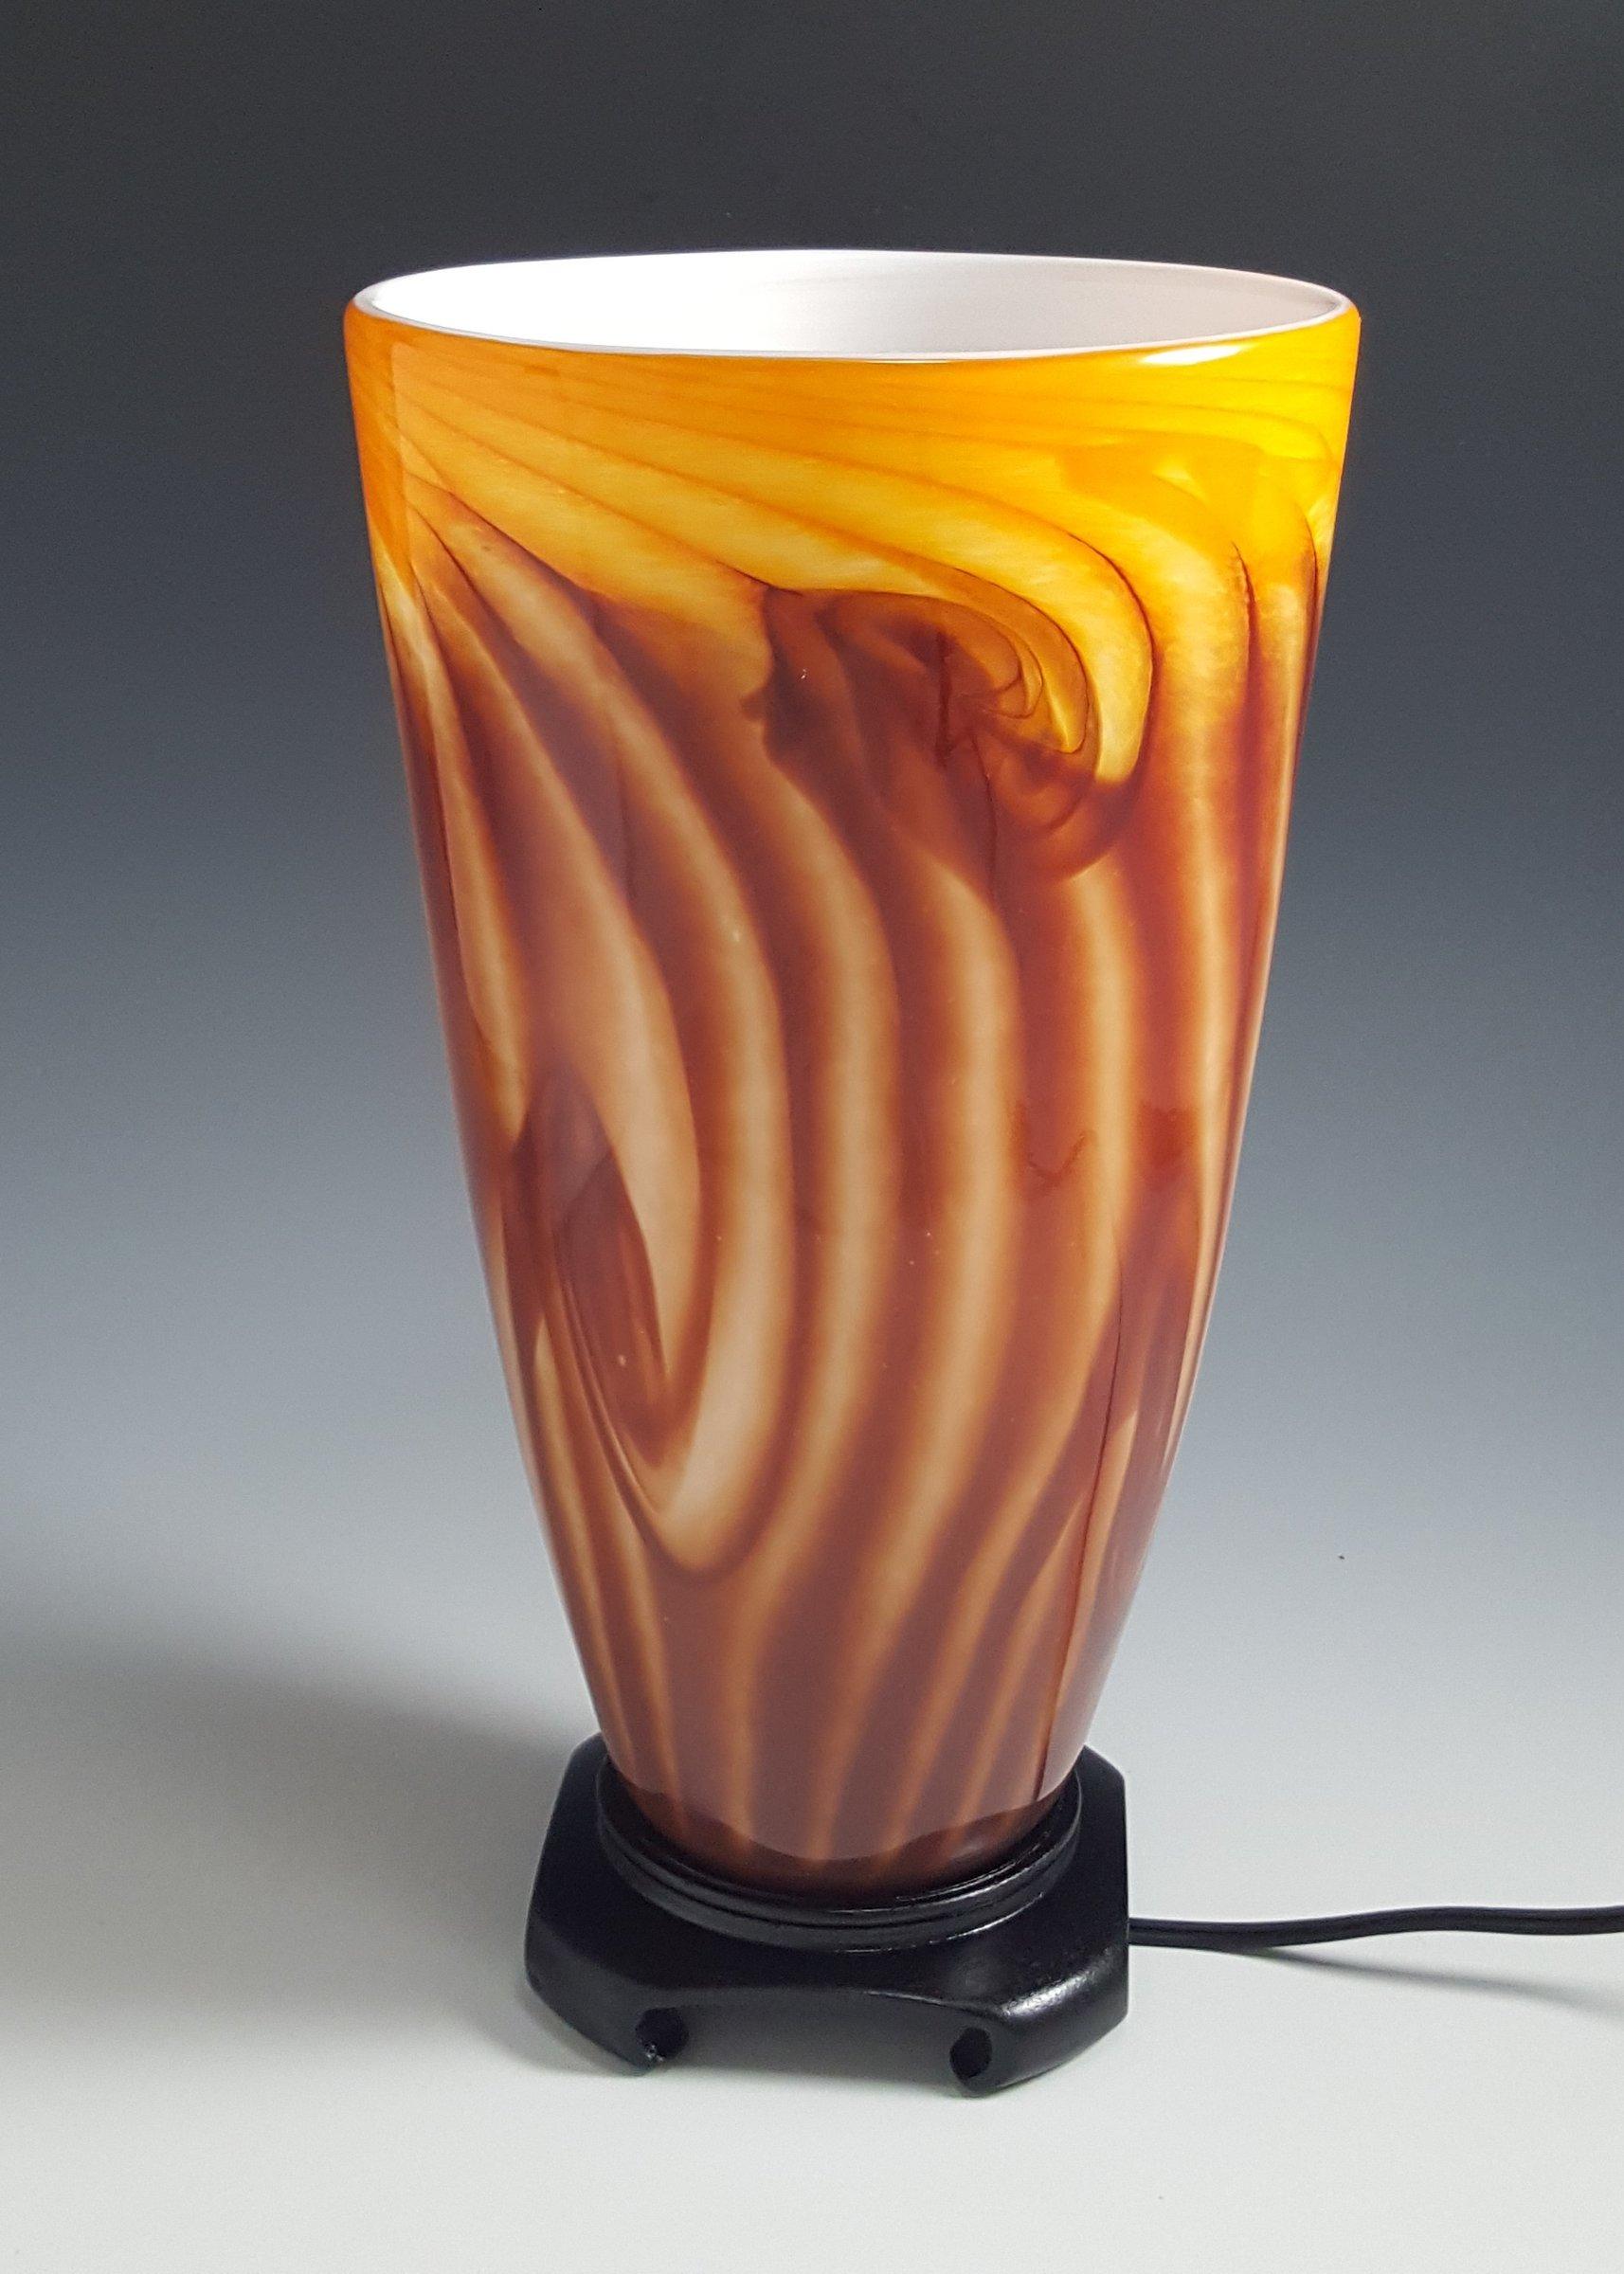 Red Gold Tall Uplight Lamp By Mark Rosenbaum Art Glass